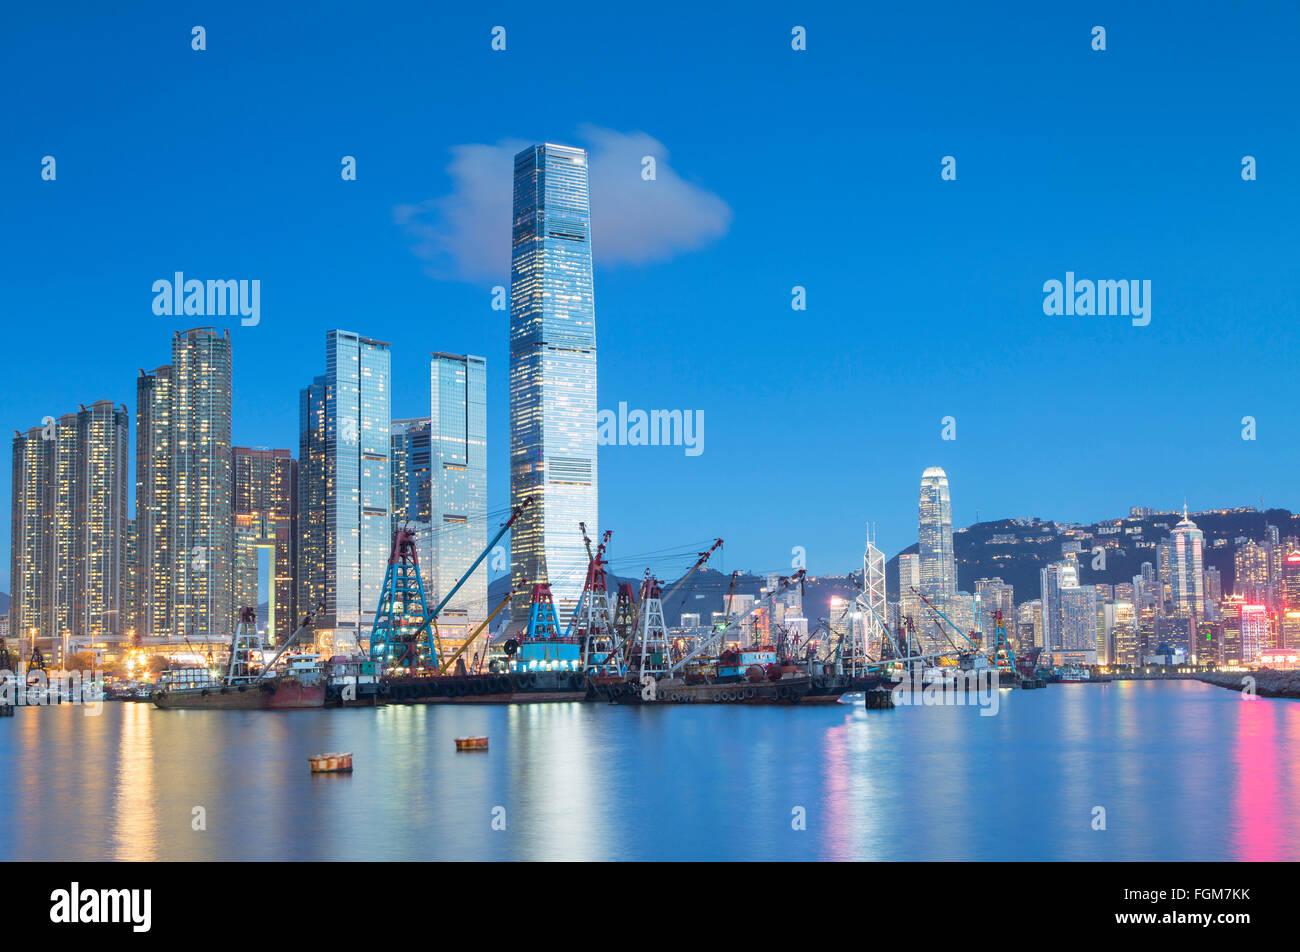 International Commerce Centre (ICC) and Yau Ma Tei Typhoon Shelter at dusk, West Kowloon, Hong Kong, China - Stock Image